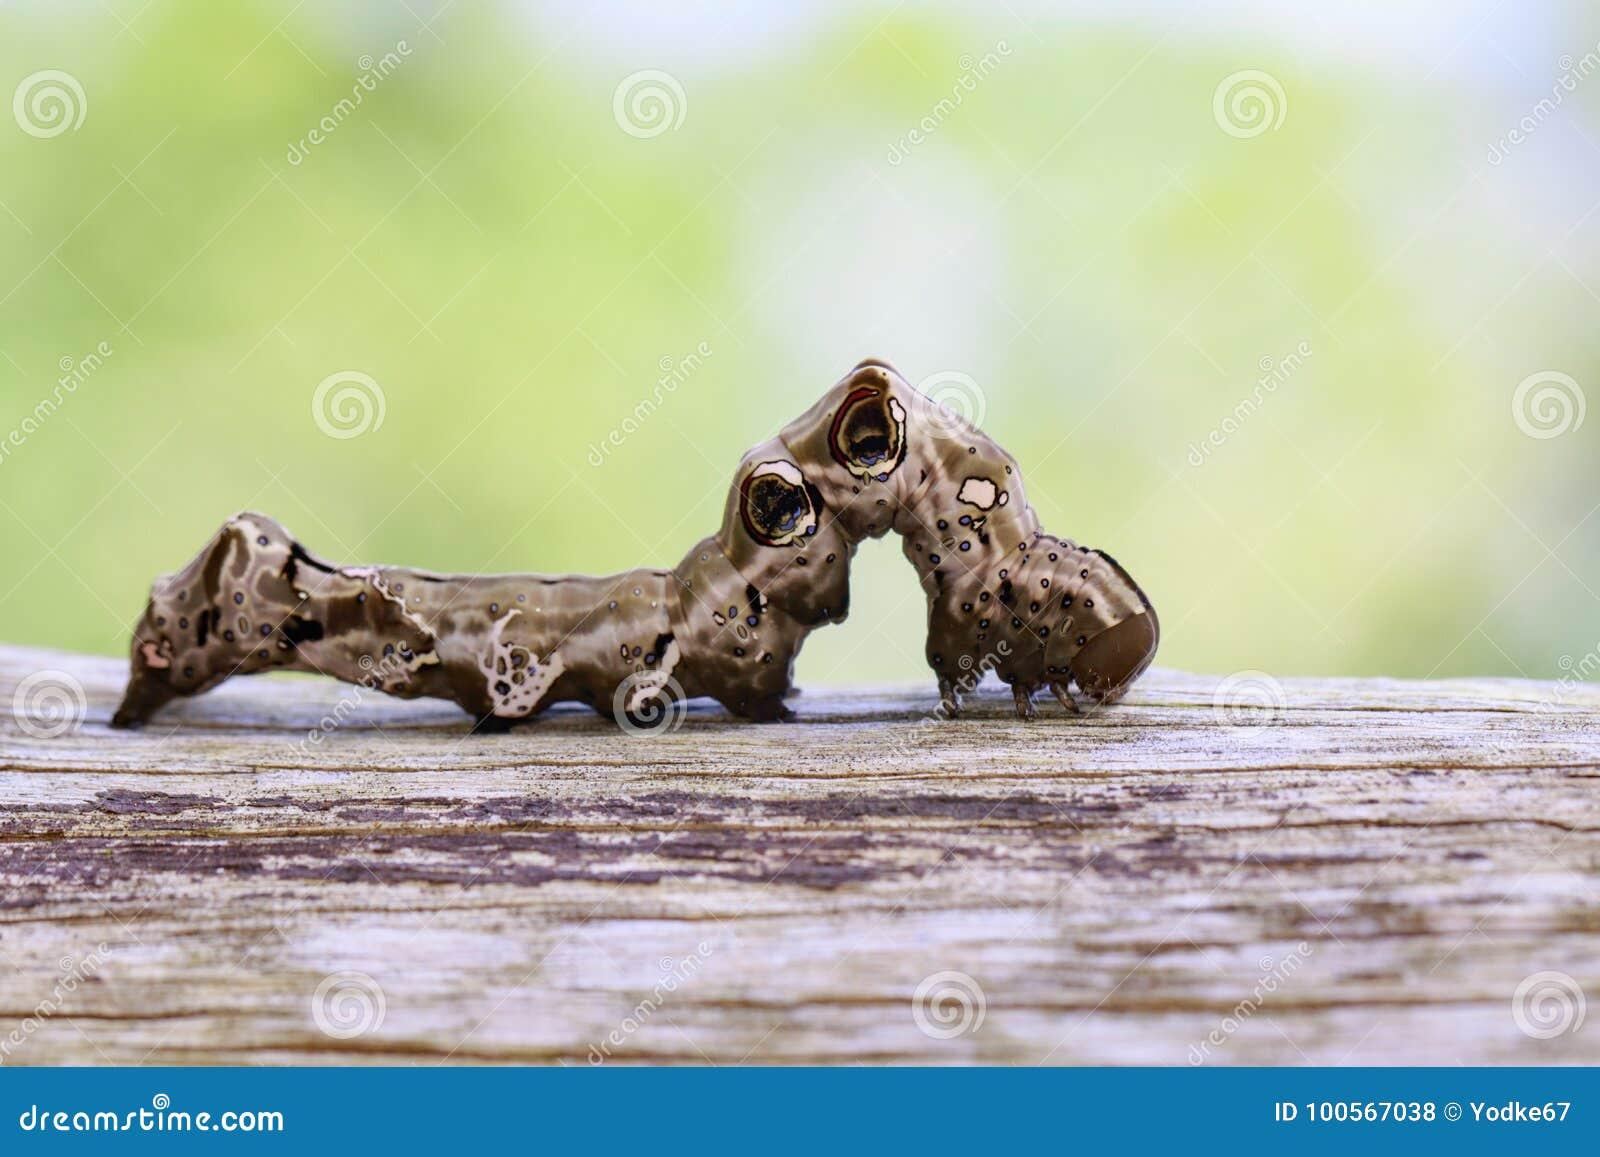 Beeld van bruine rupsband op bruin droog hout insect Dier